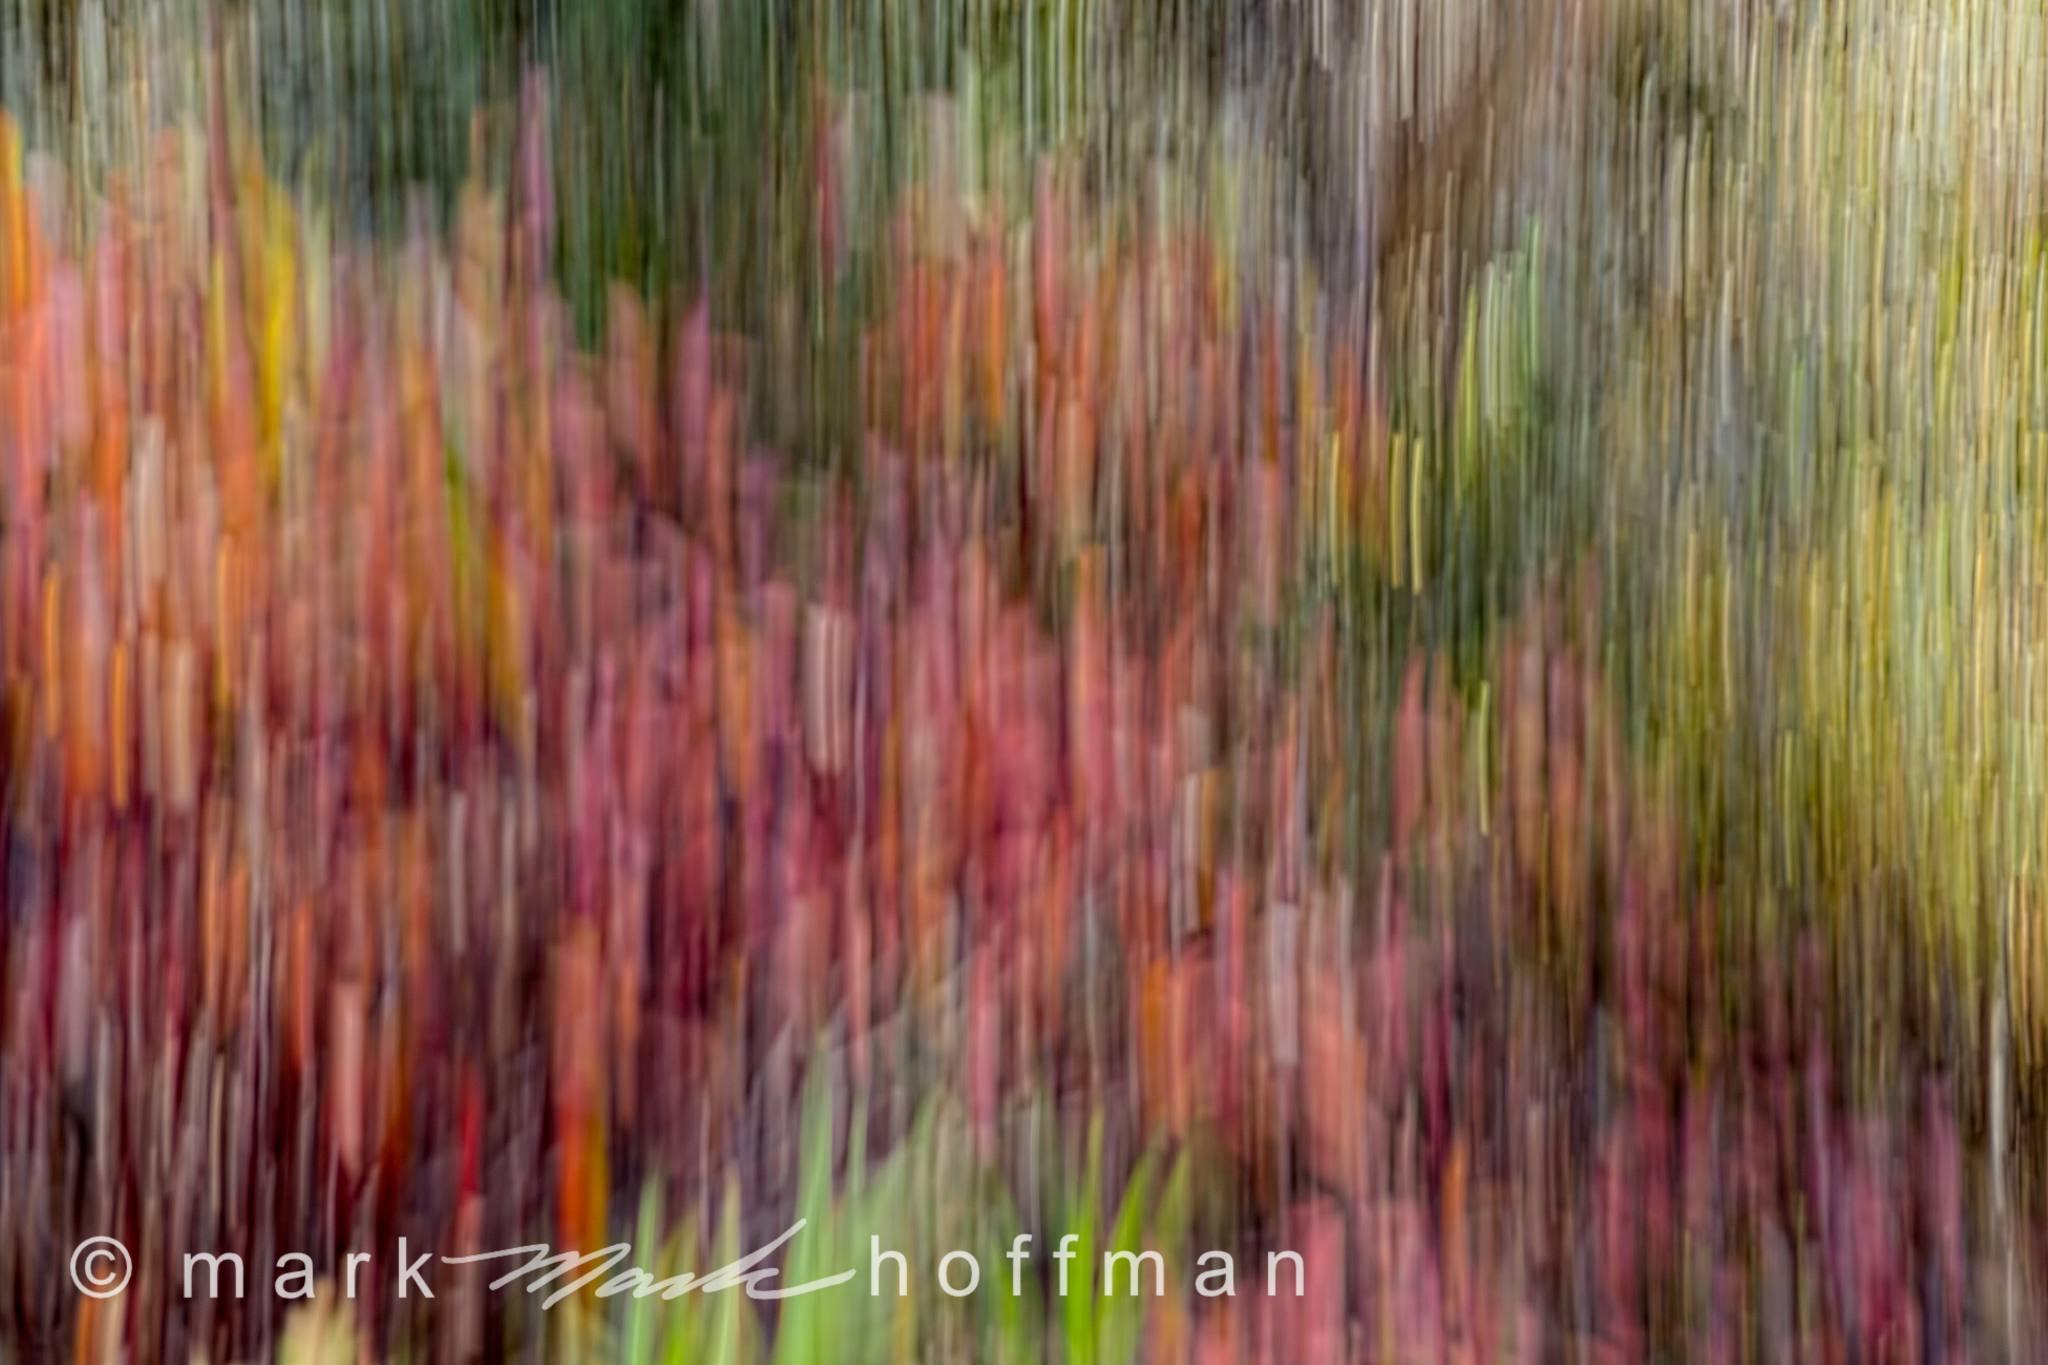 Mark_Hoffman_photophart_20150925_0071_v1_cap1_var1.jpg